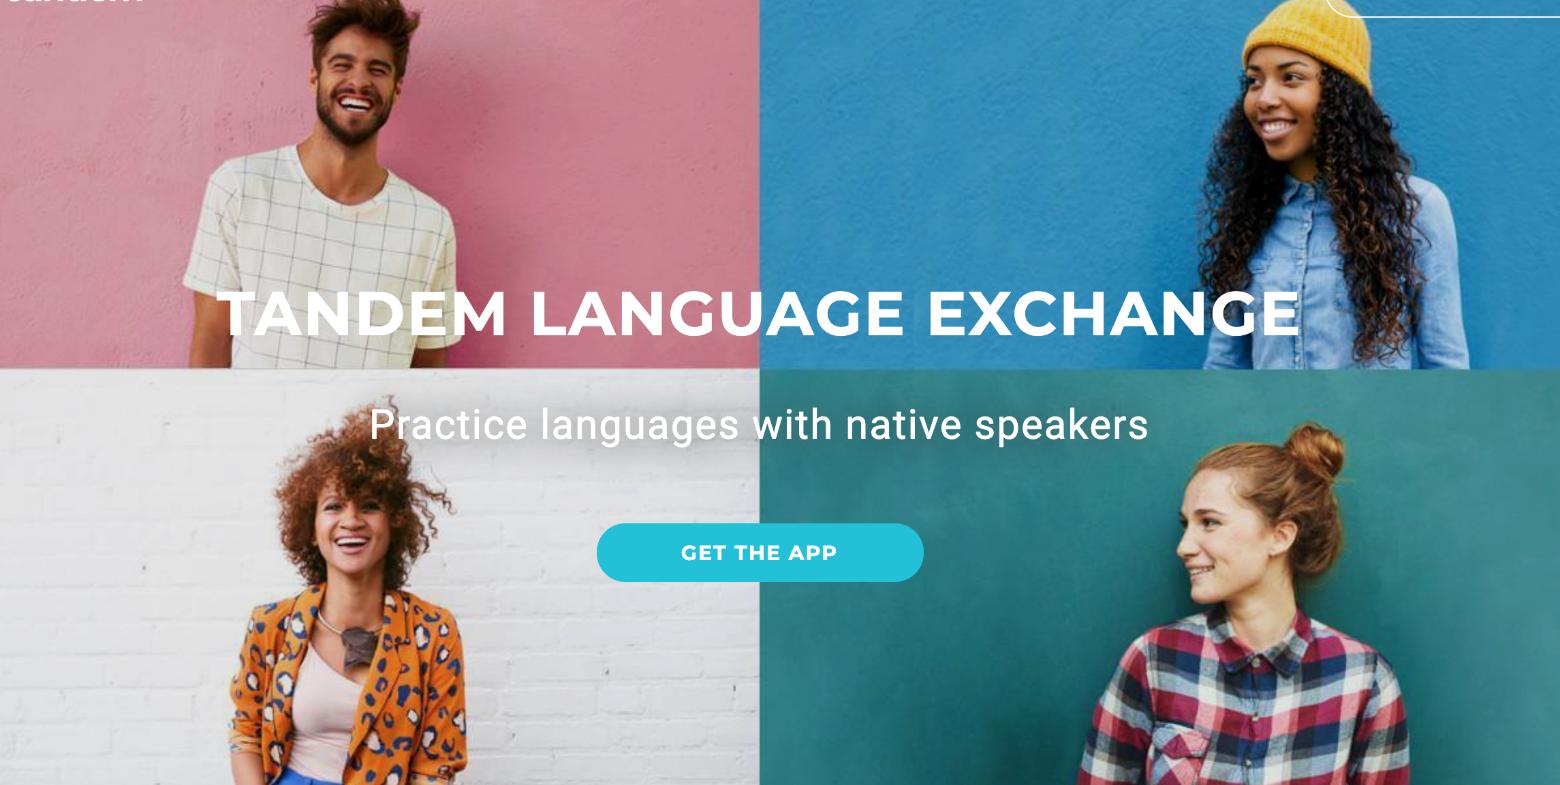 Tandem - Discover this Language Exchange Community to Improve English Skills